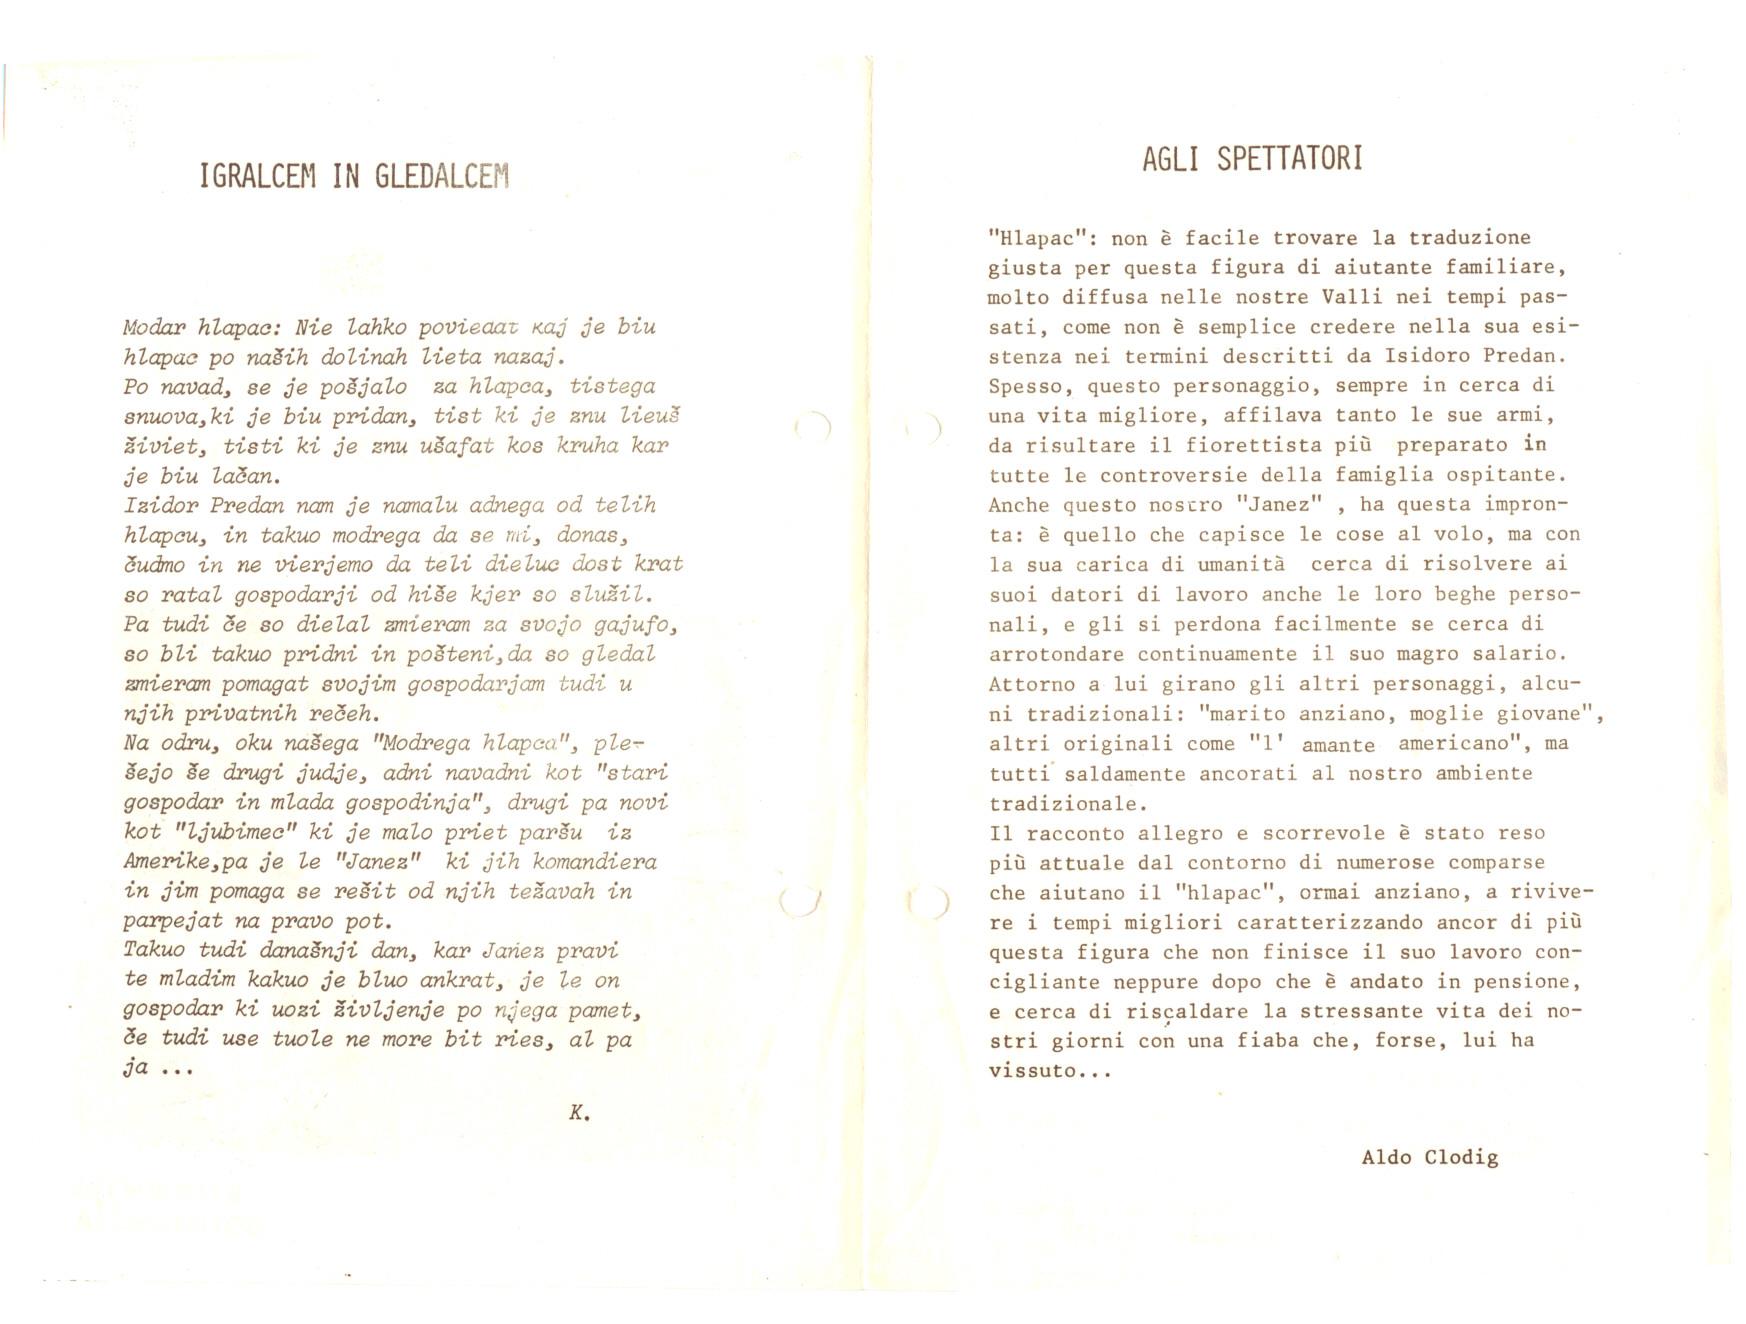 1979 - Modar Hlapac - Foglio di sala 2